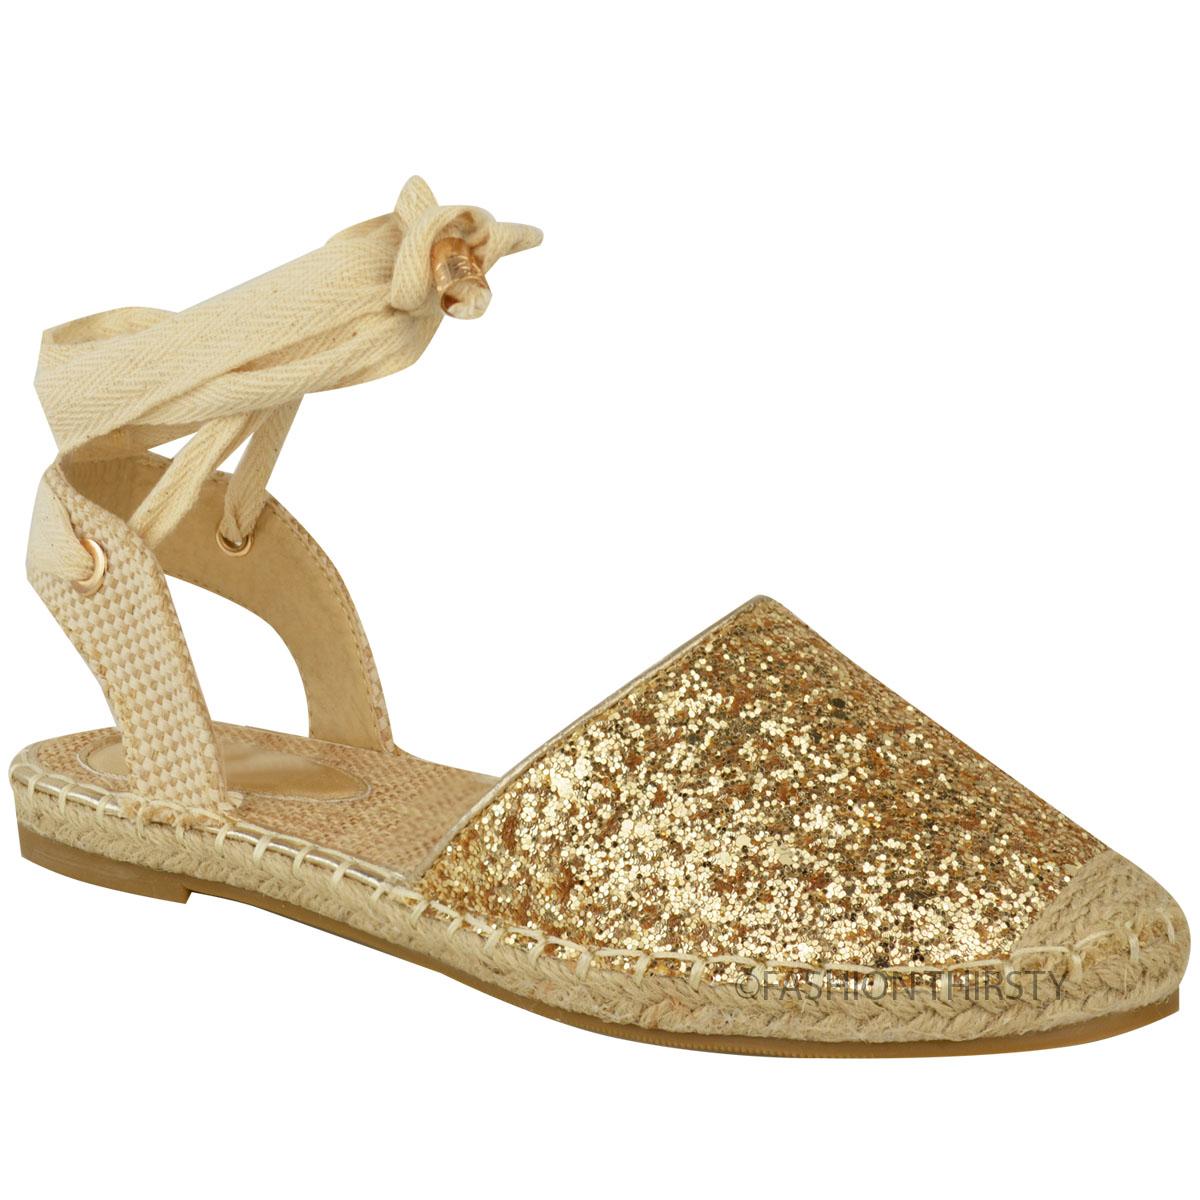 Womens Ladies Glitter Espadrilles Flat Low Heel Sandals